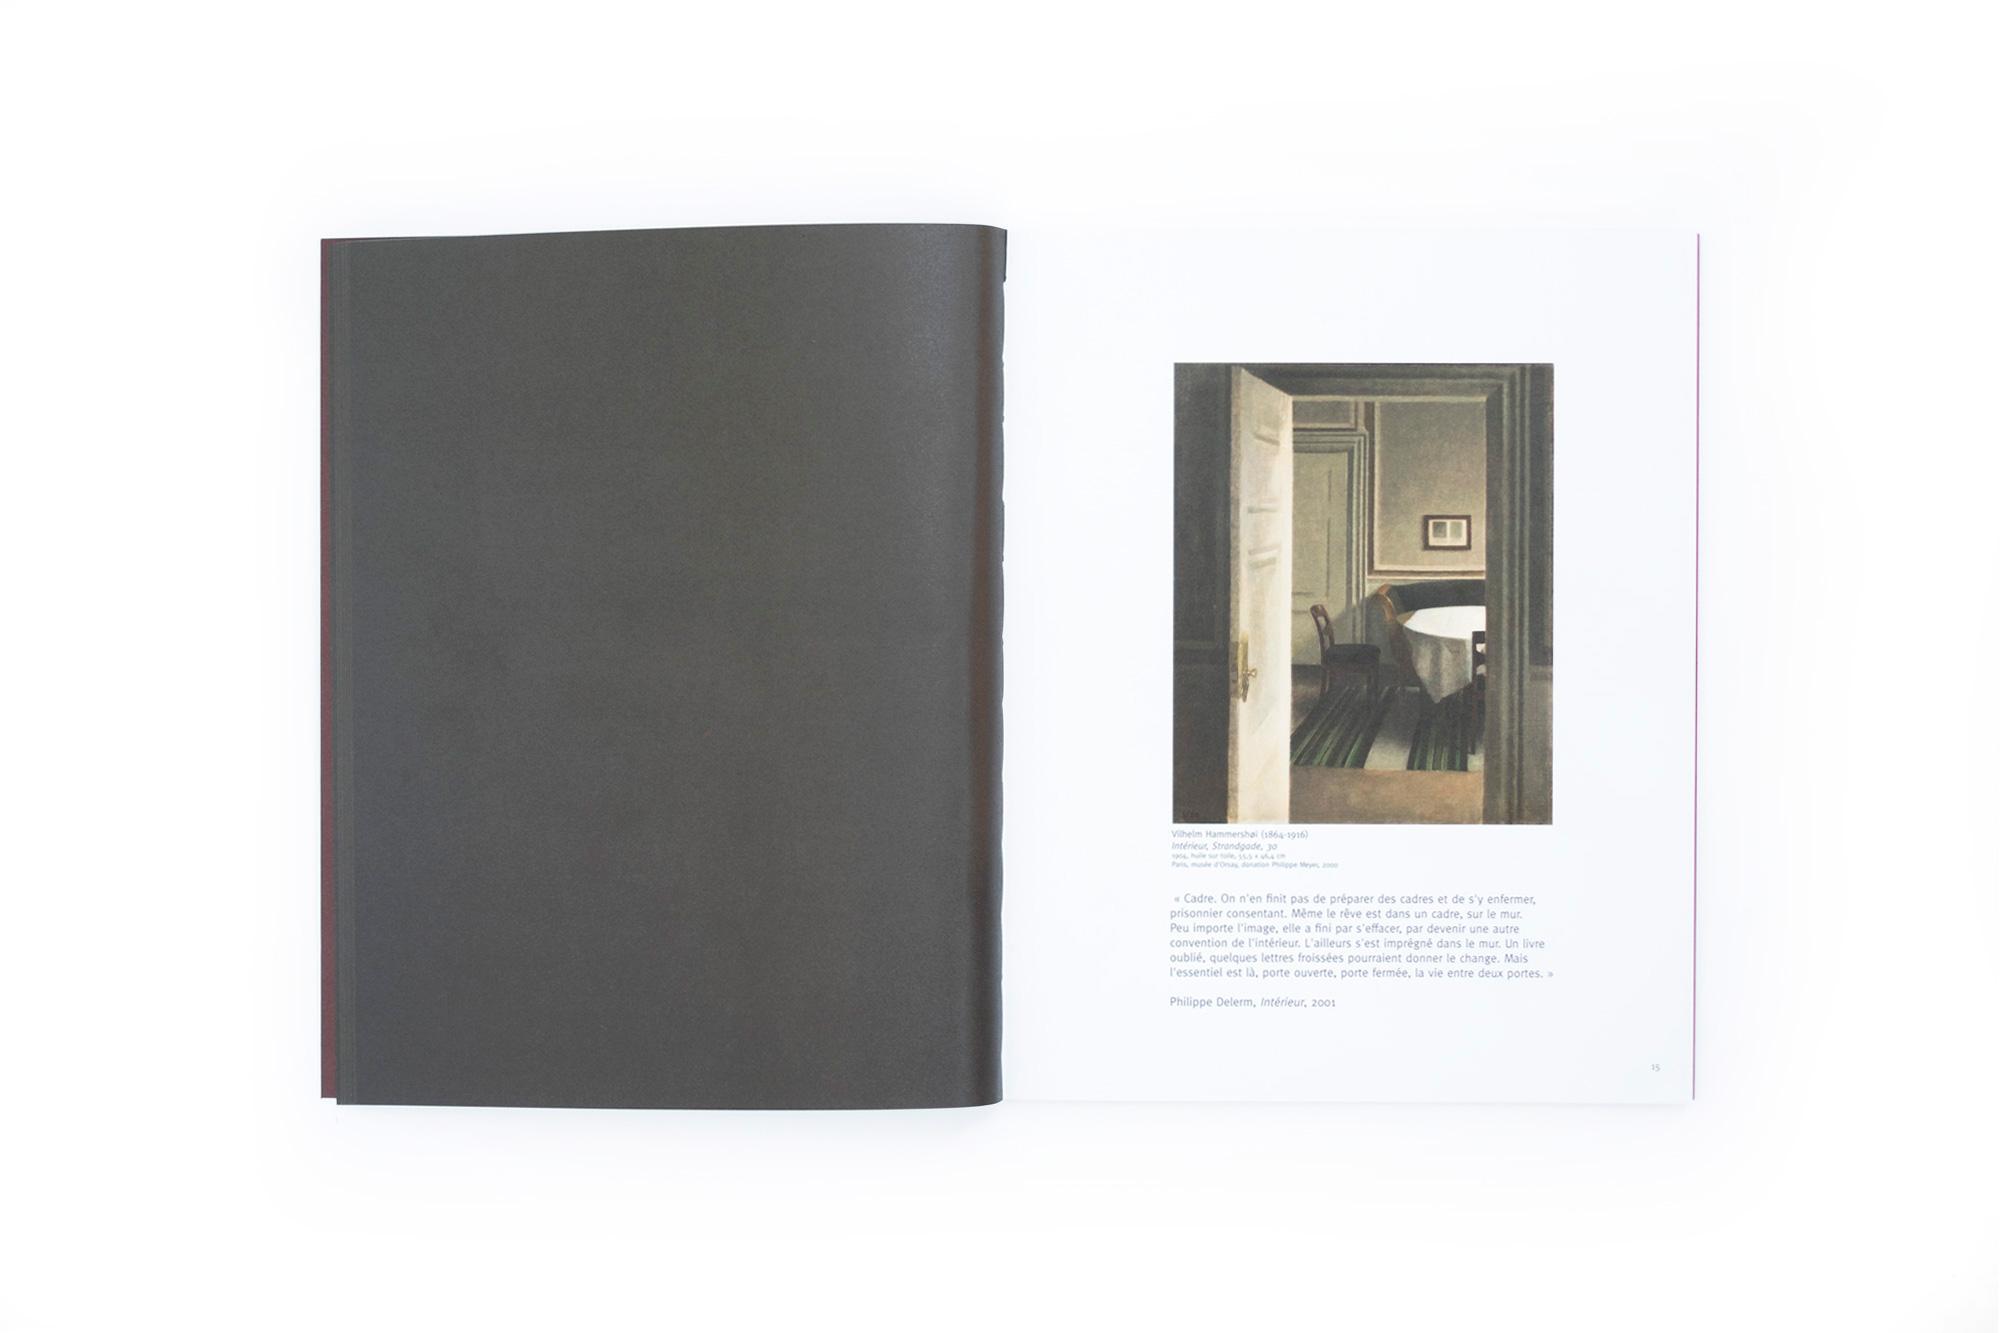 trine_sondergaard_lumieres_nordiques_spread_book_hammershoi3